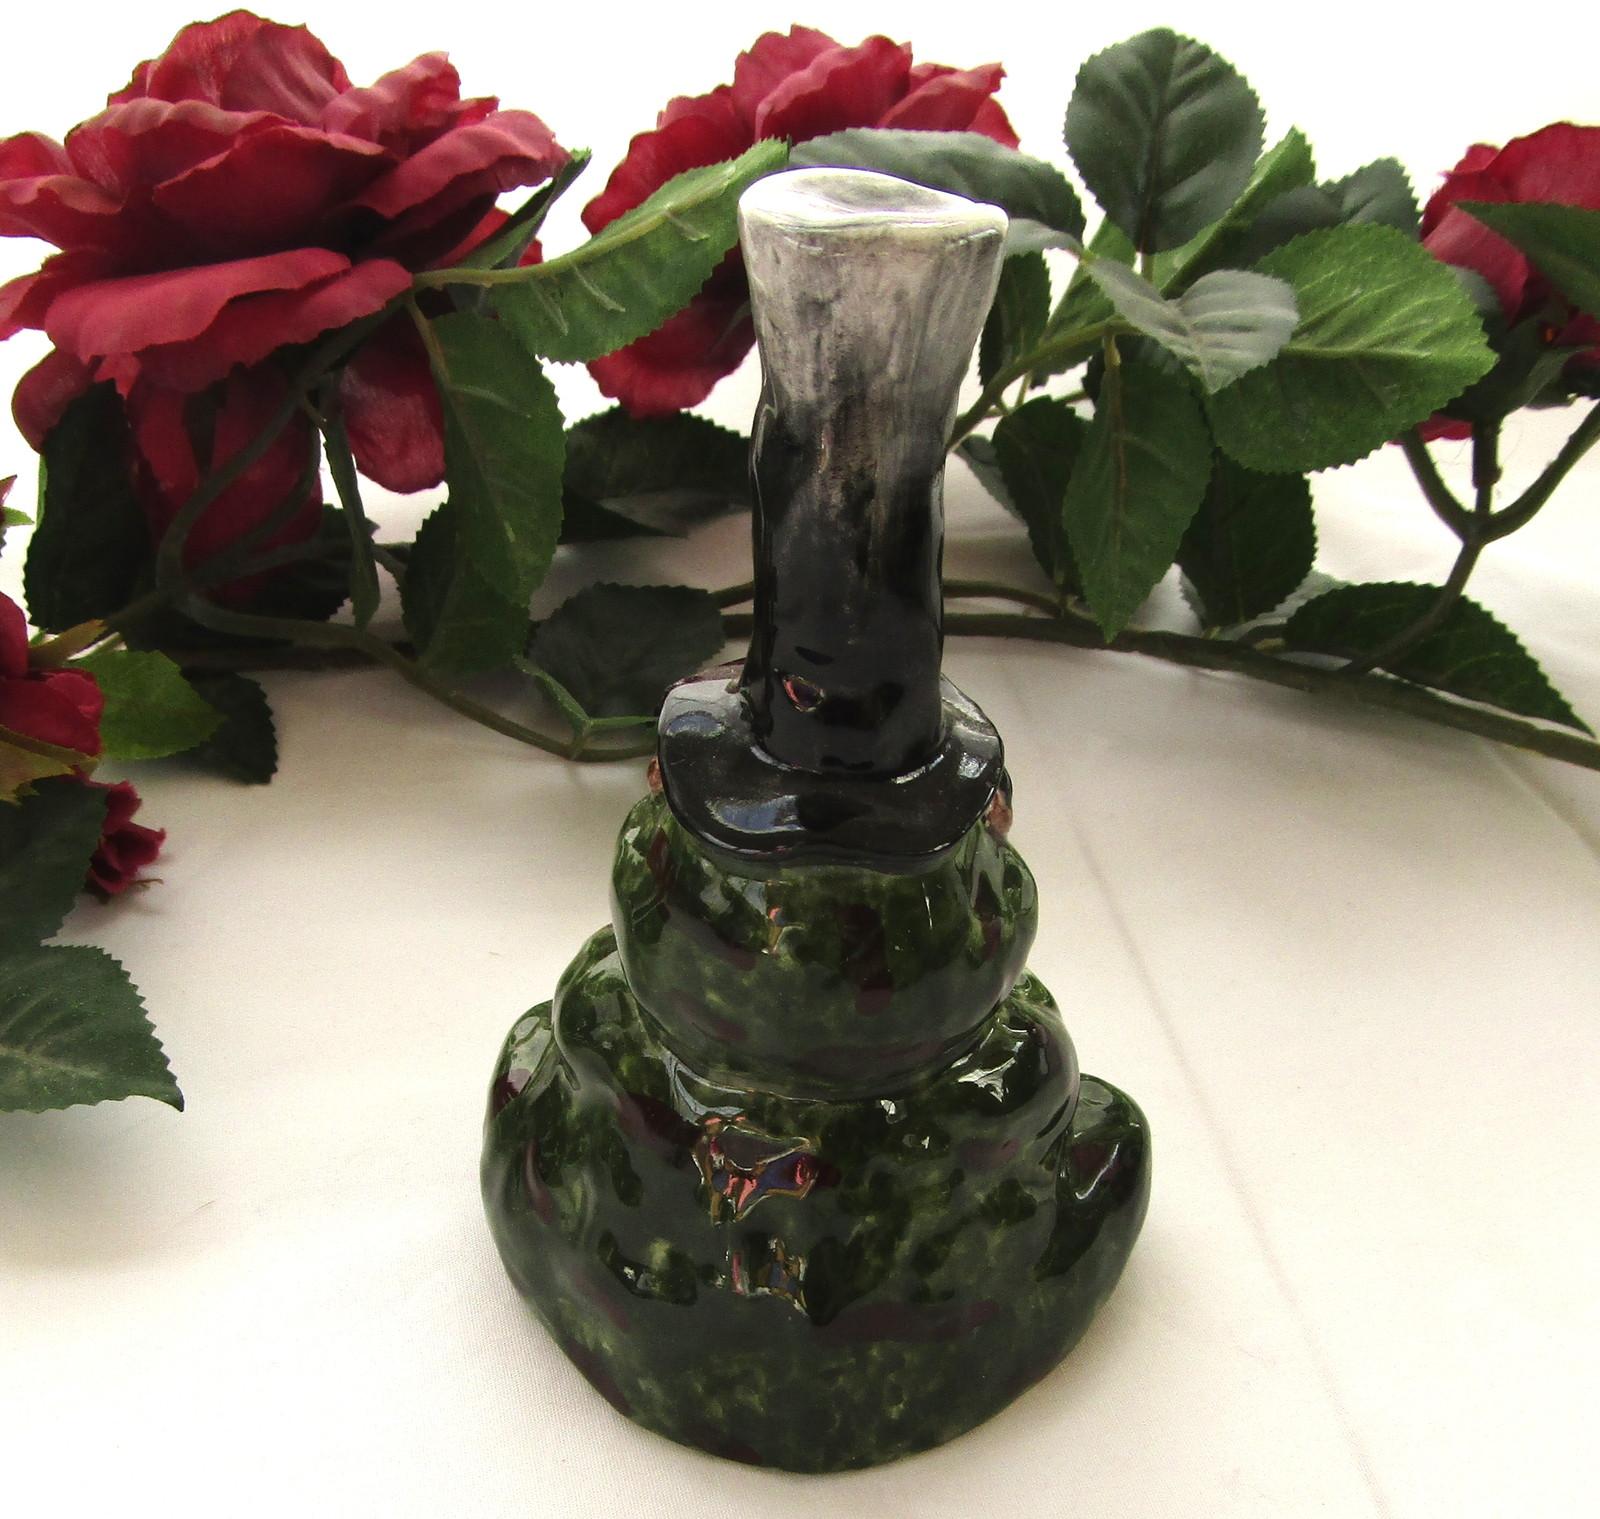 Ceramic Bell, Frog, Apple Tree Designs